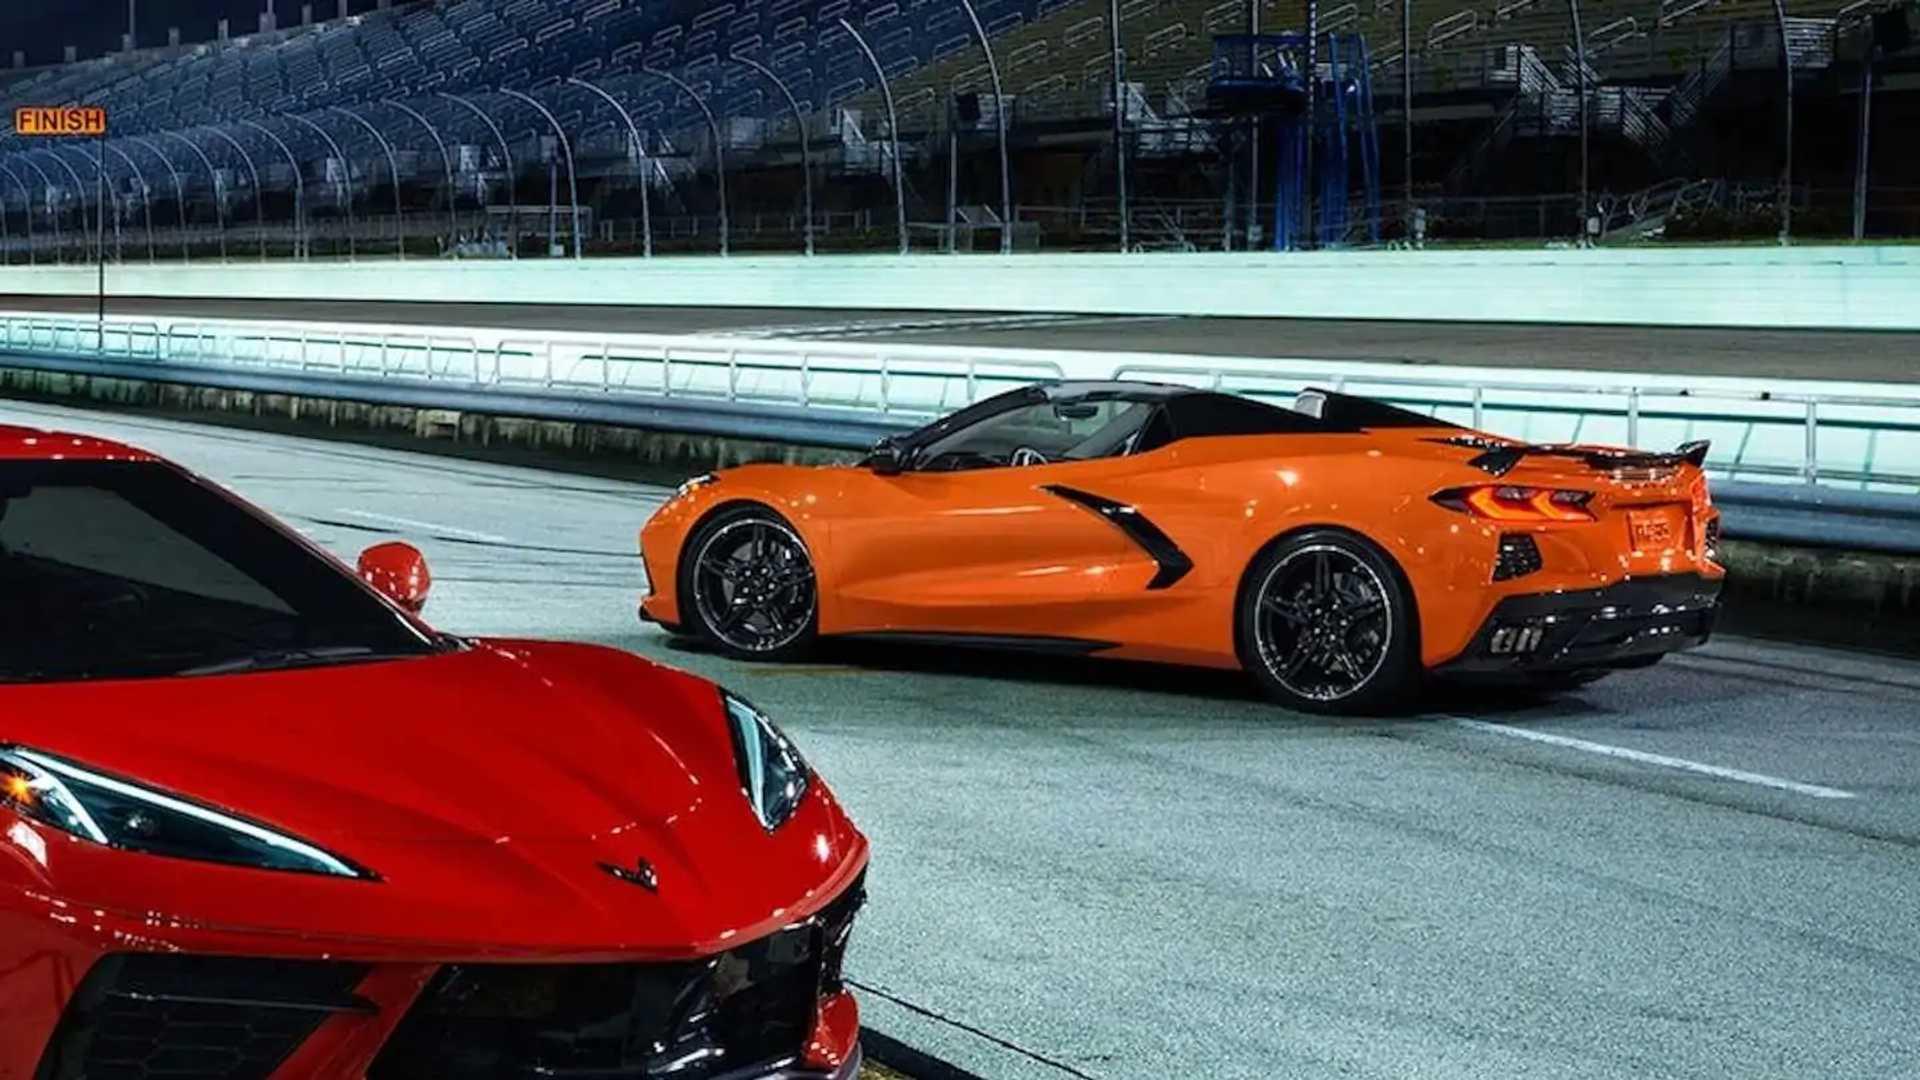 2022 Chevrolet Corvette New Colors - Amplify Orange